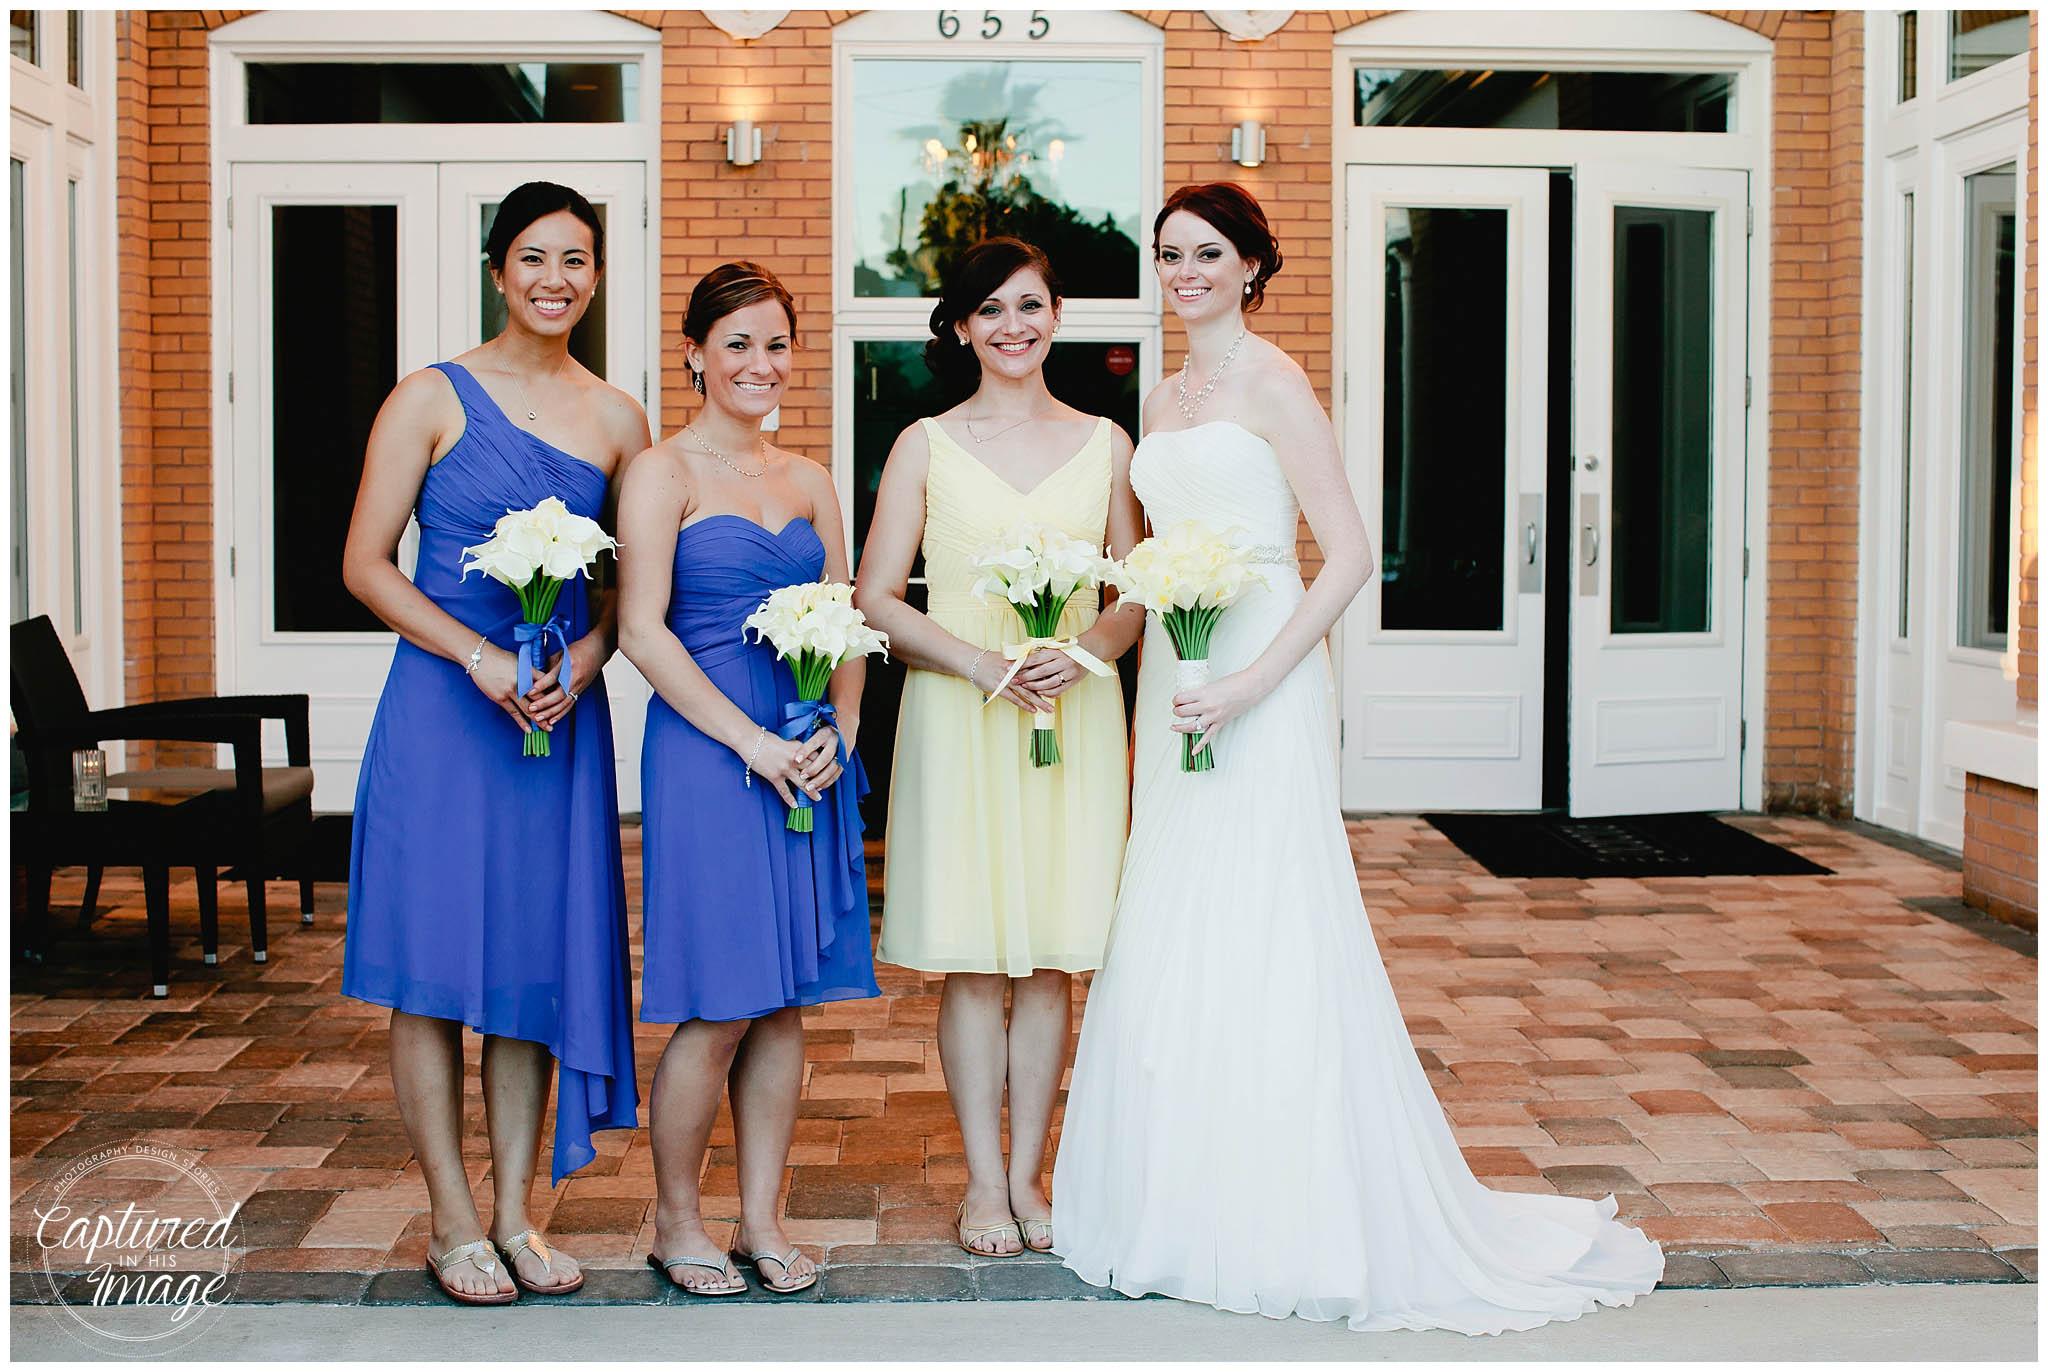 St. Pete Beach Destination Wedding (44 of 81)